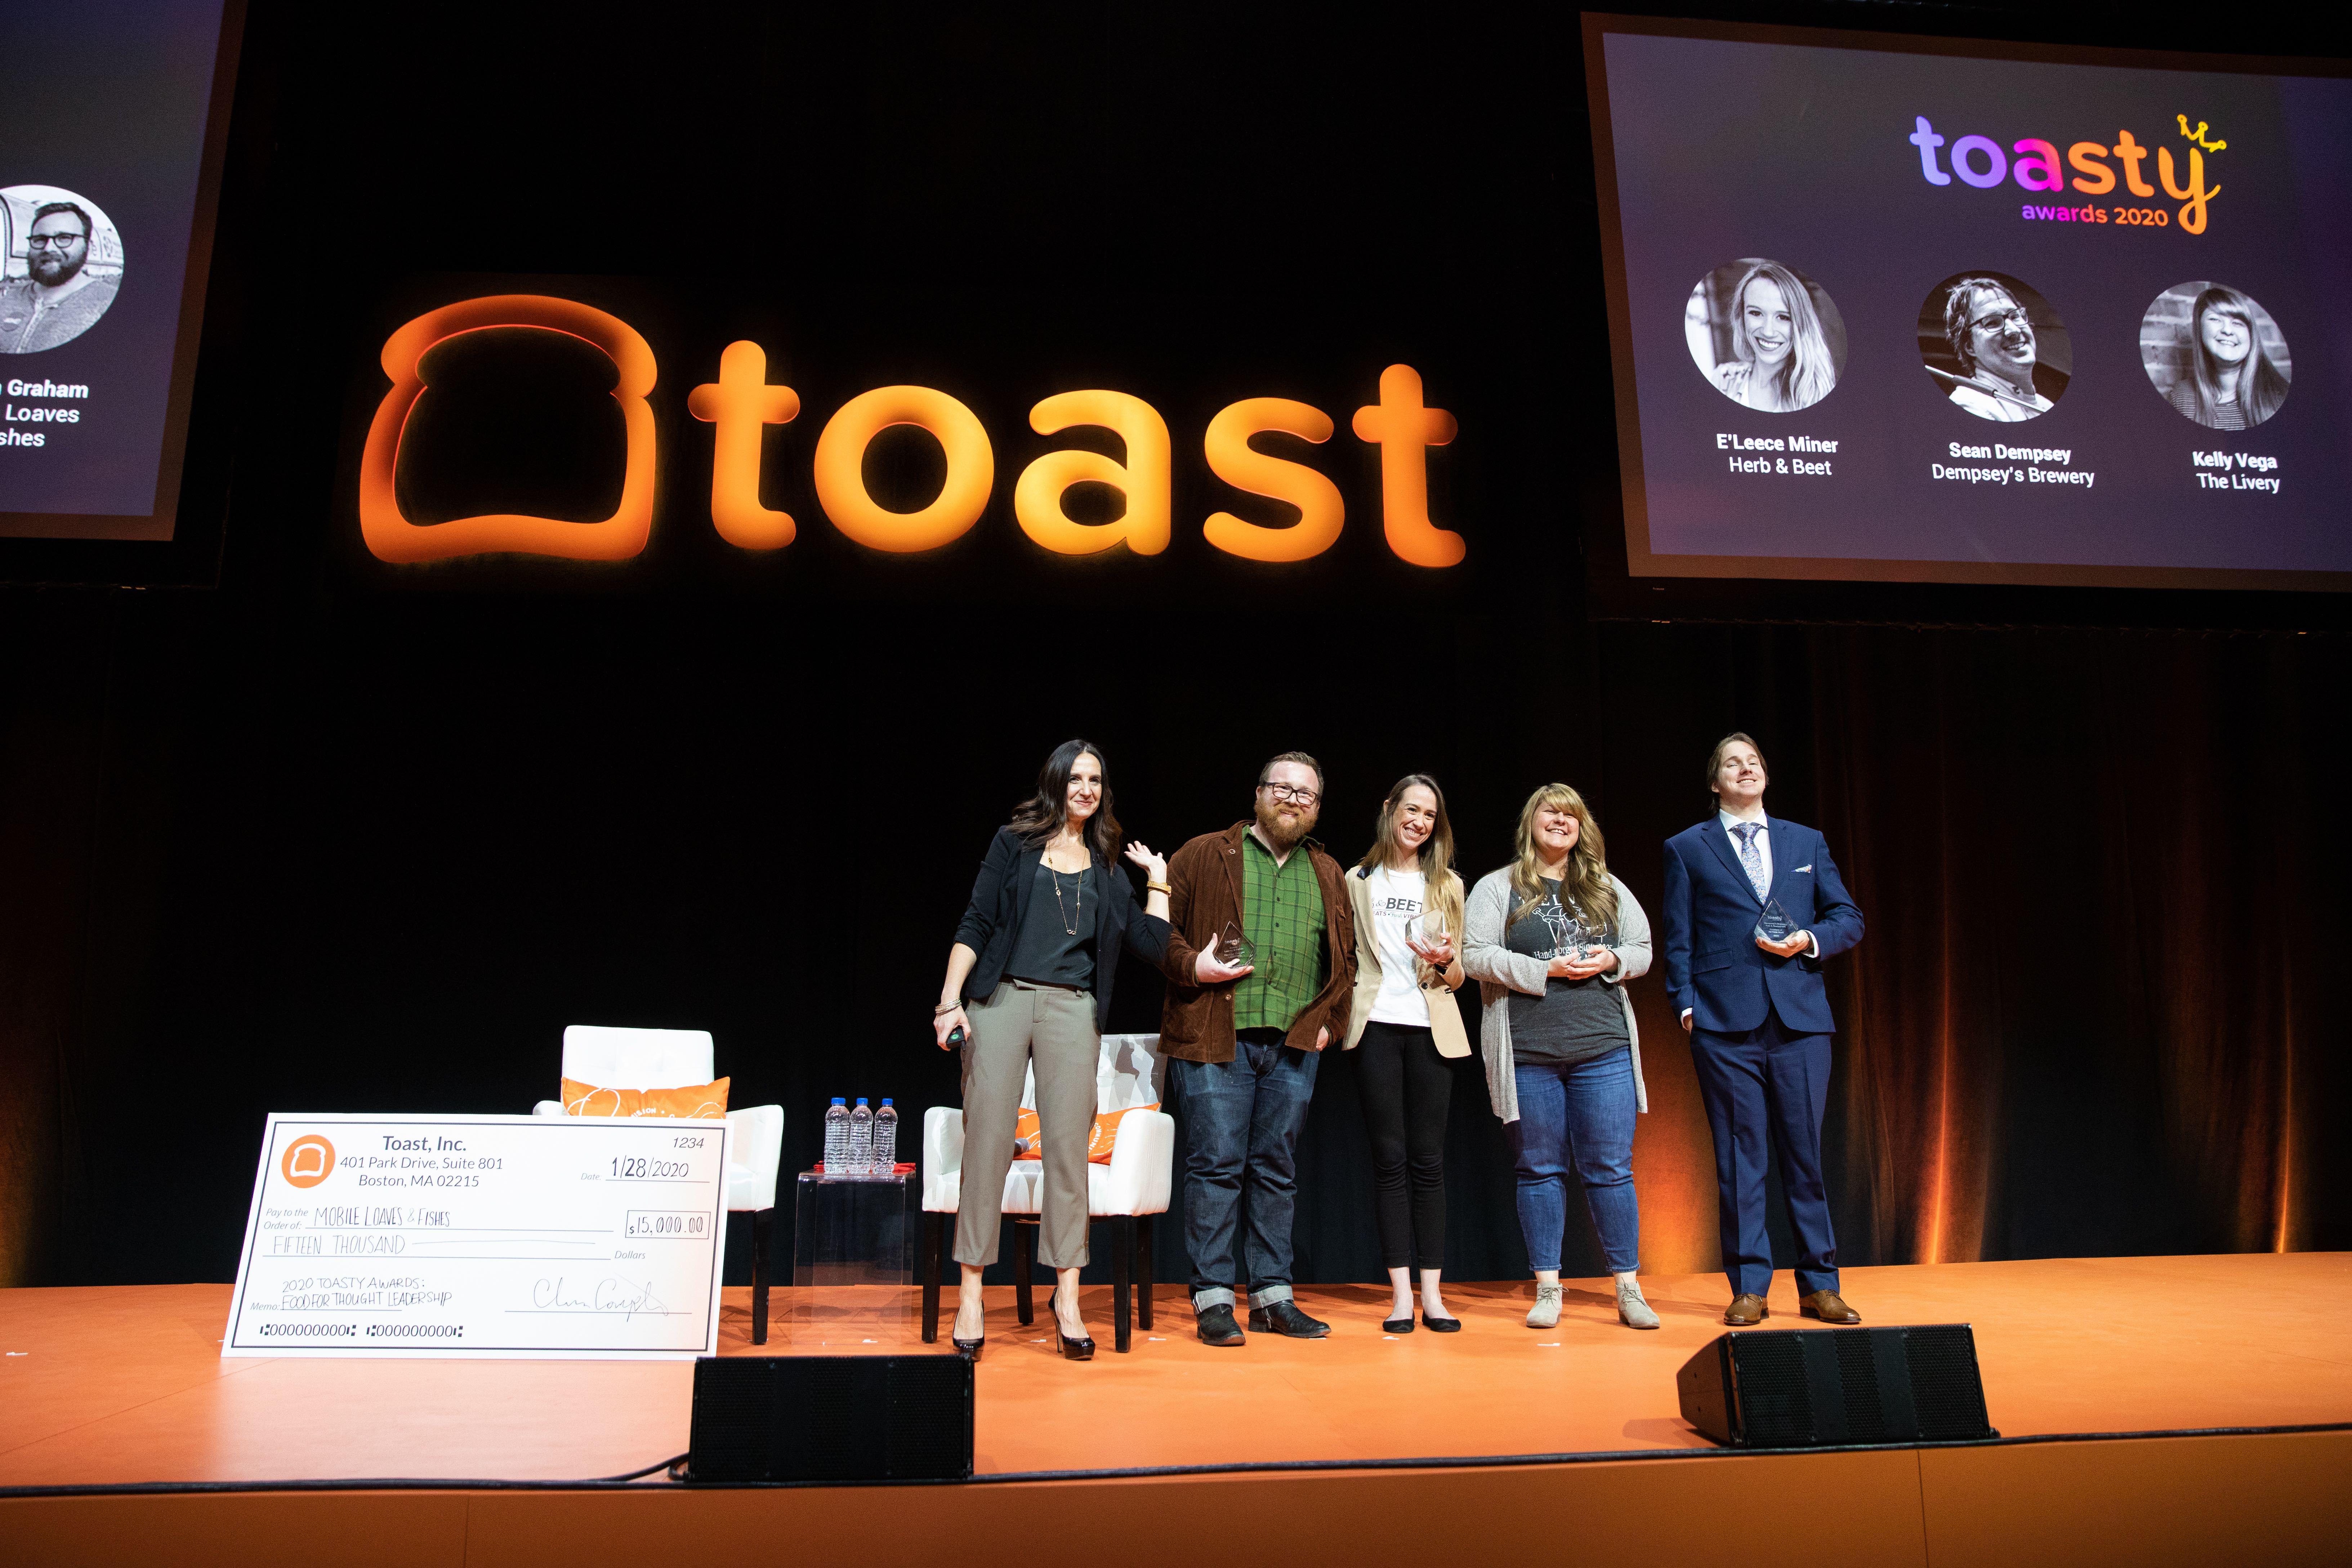 Toasty Award Winners 2020